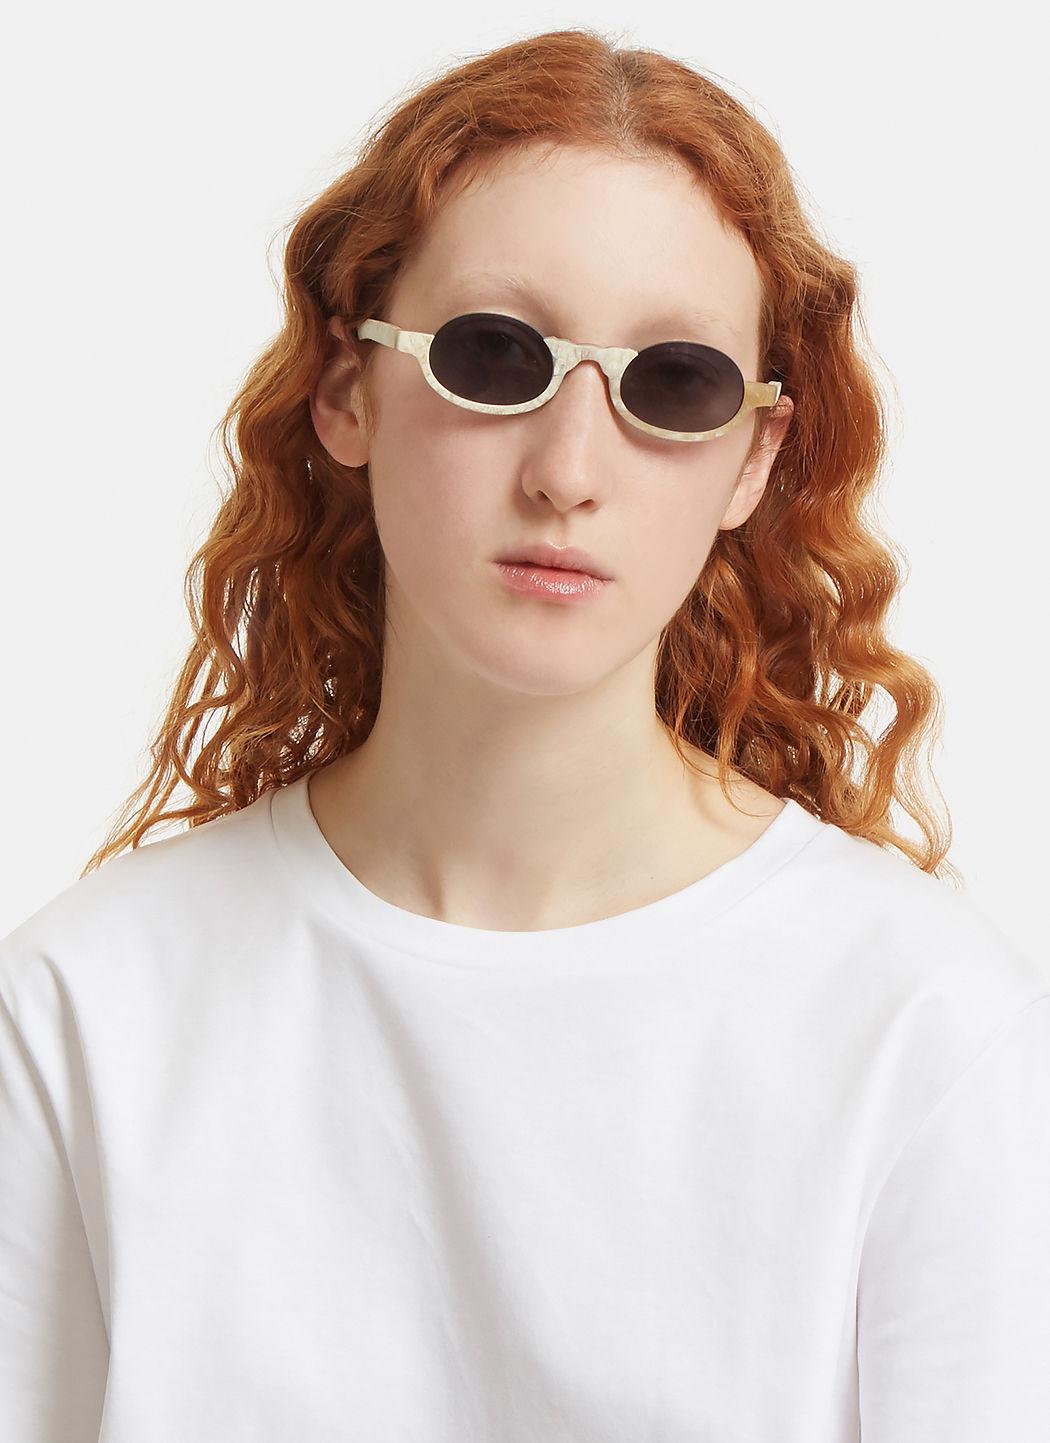 Genuine Horn Eyewear by Rigards